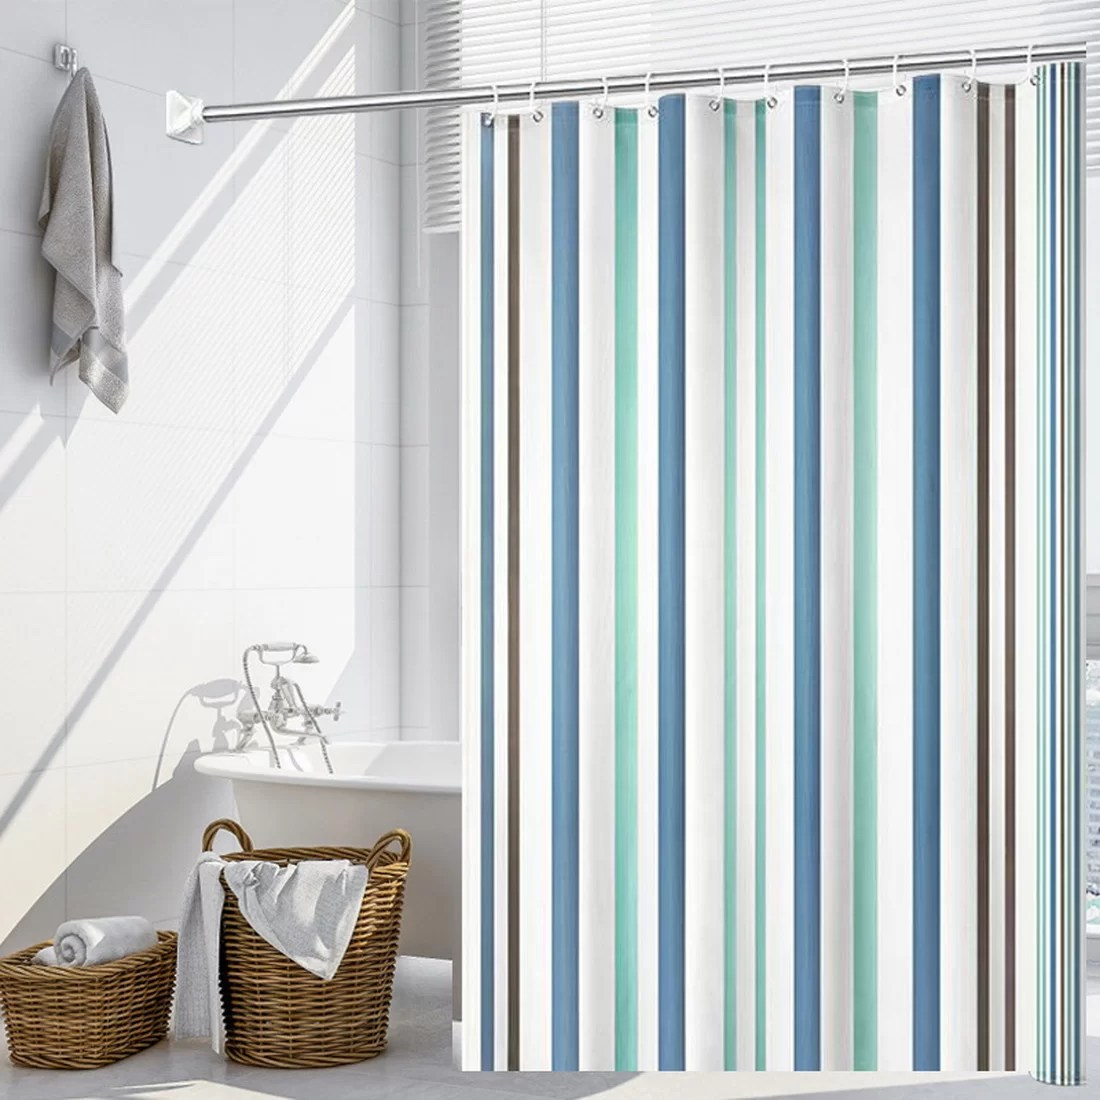 epps 13 piece striped shower curtain set hooks